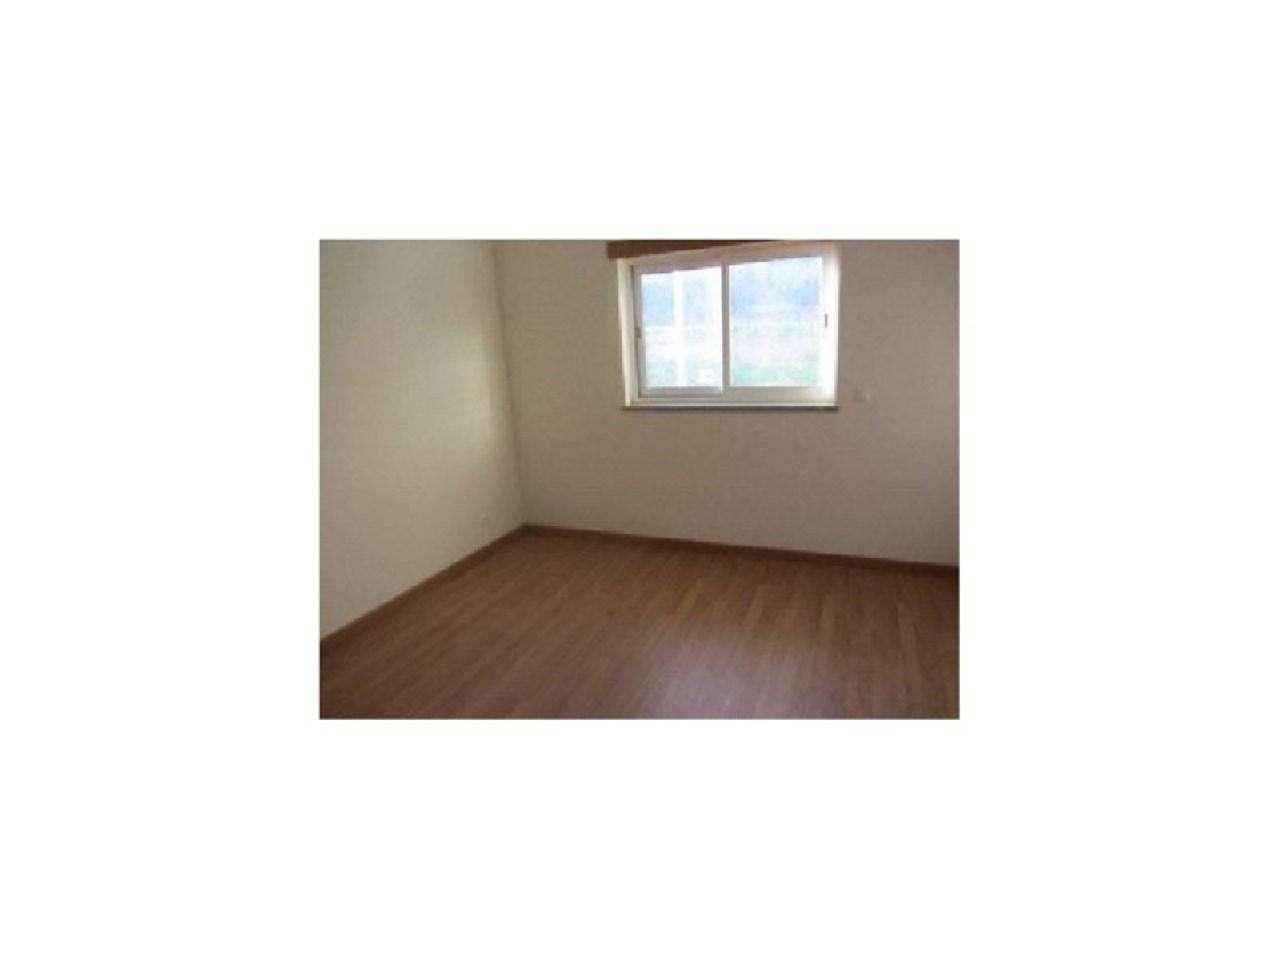 Apartamento para comprar, Caria, Belmonte, Castelo Branco - Foto 2